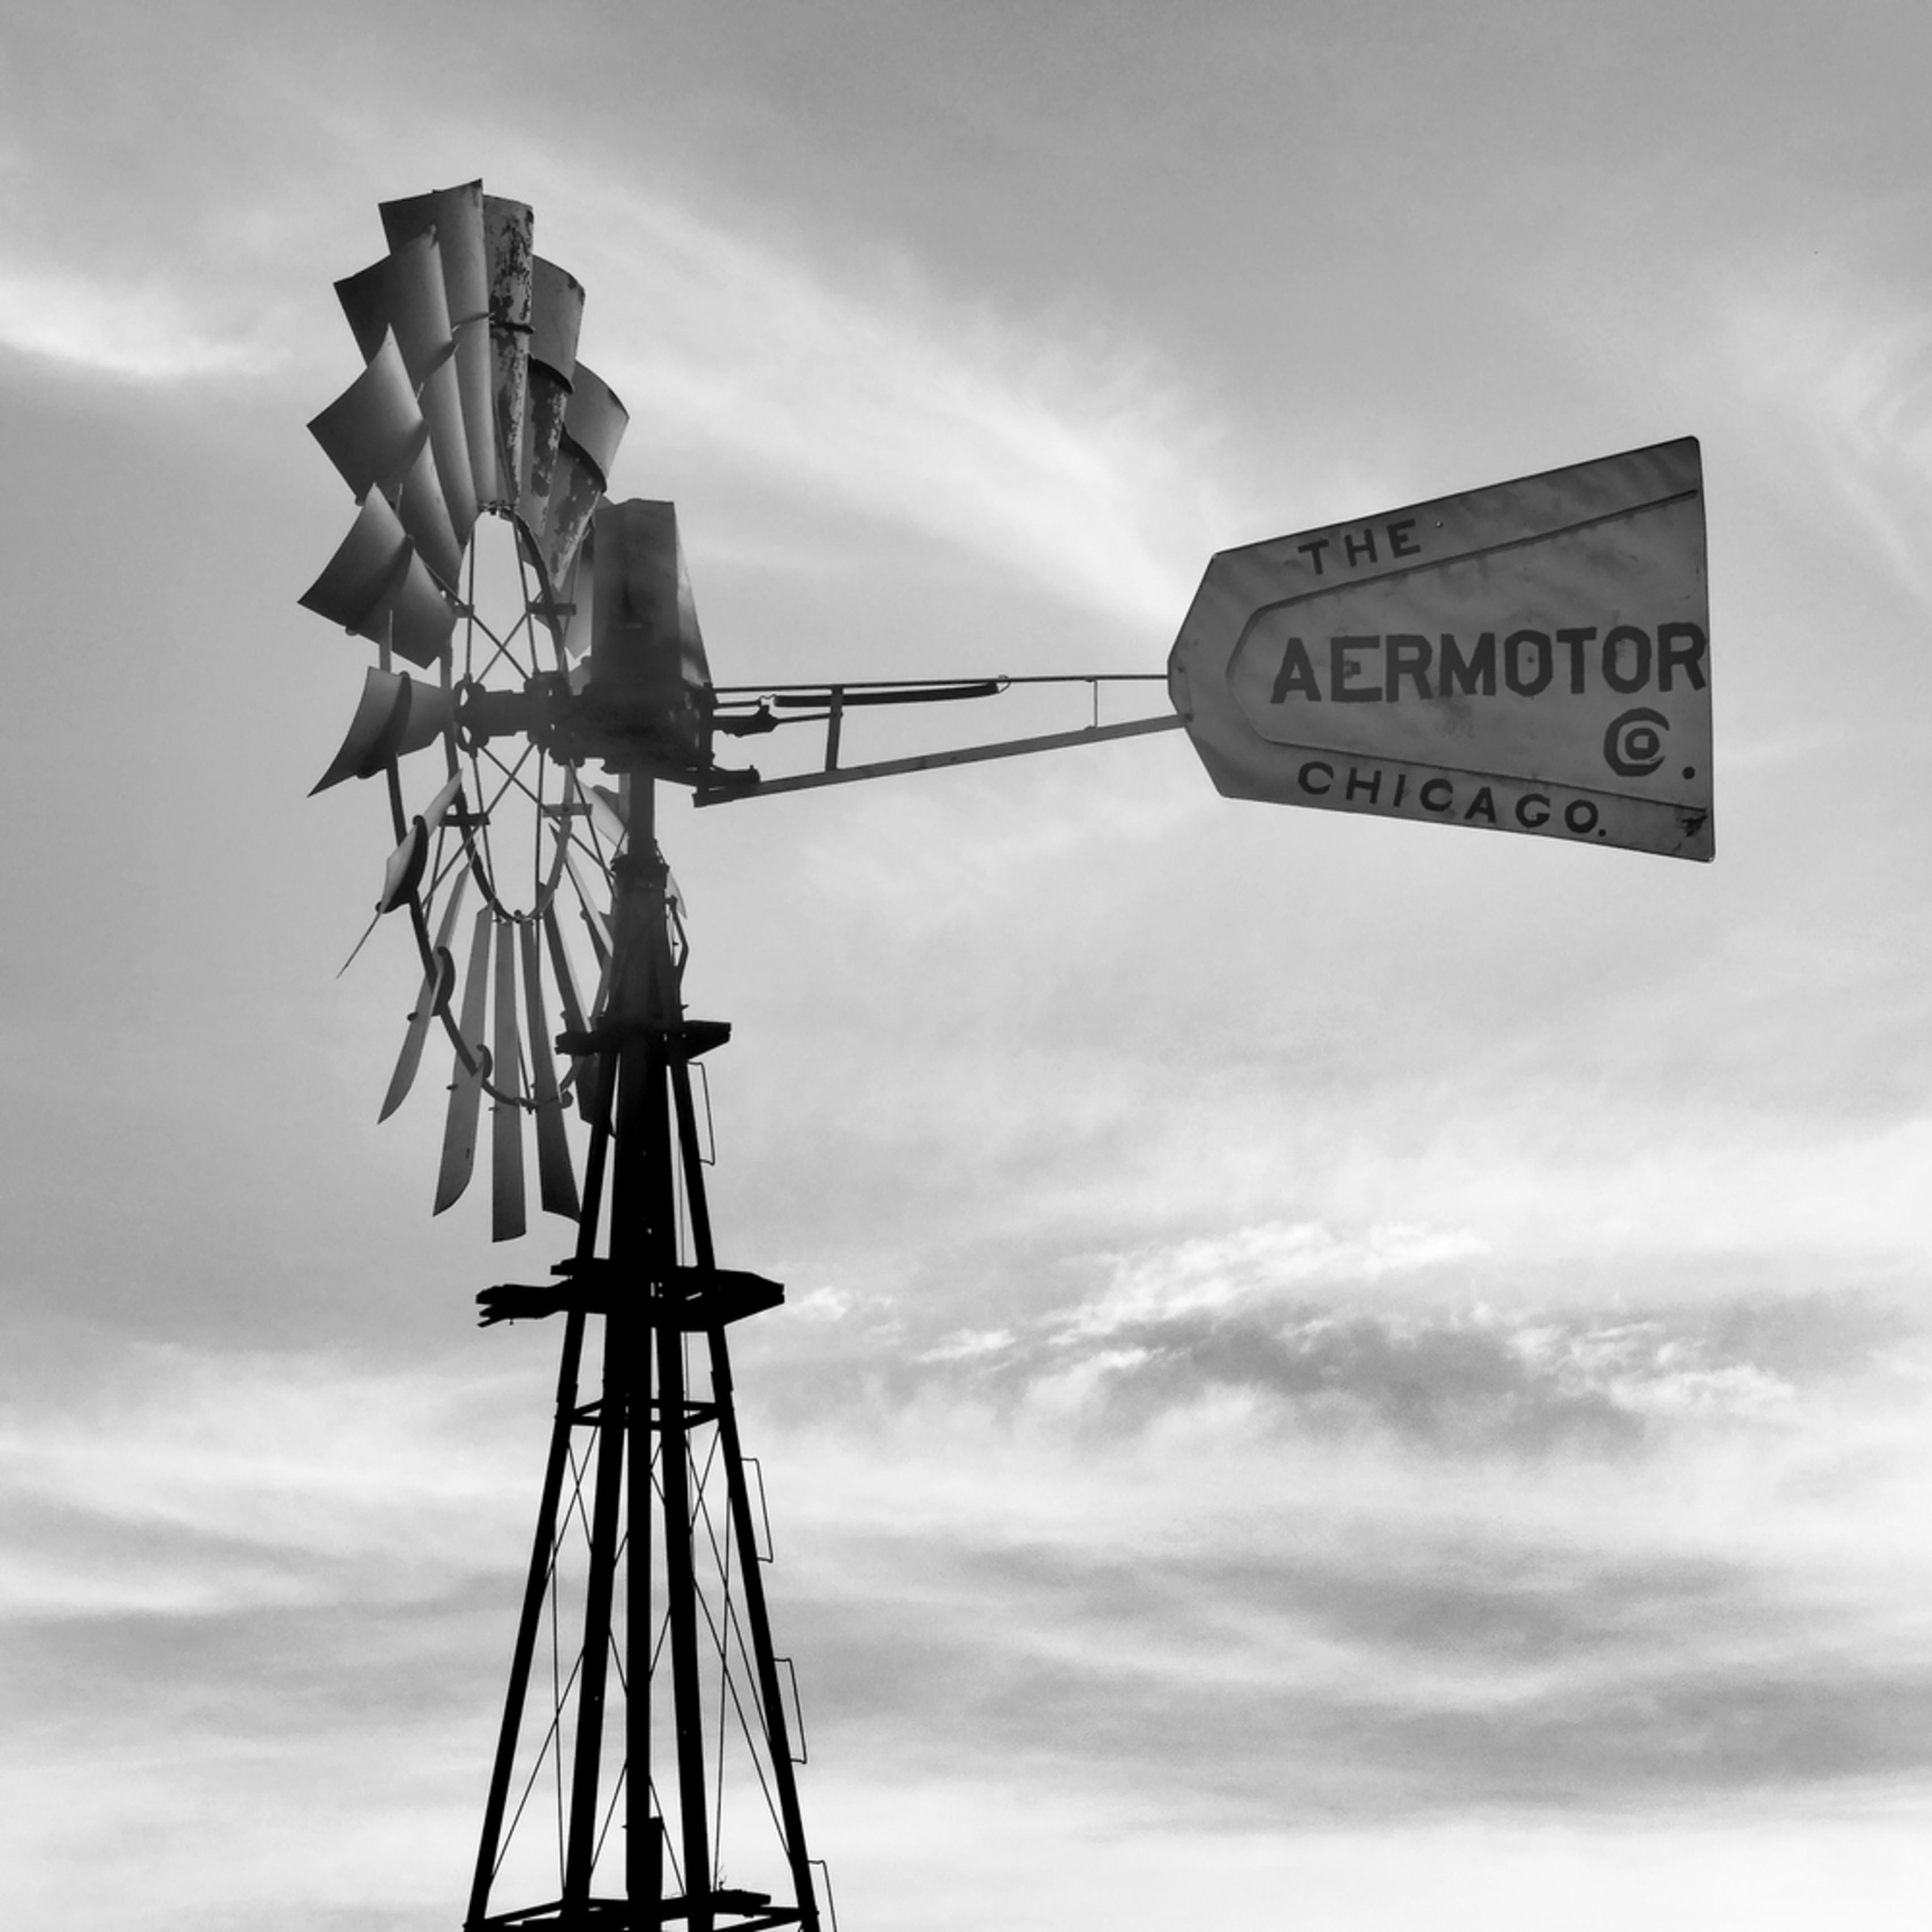 Dscn2098 aermotor unvsbo